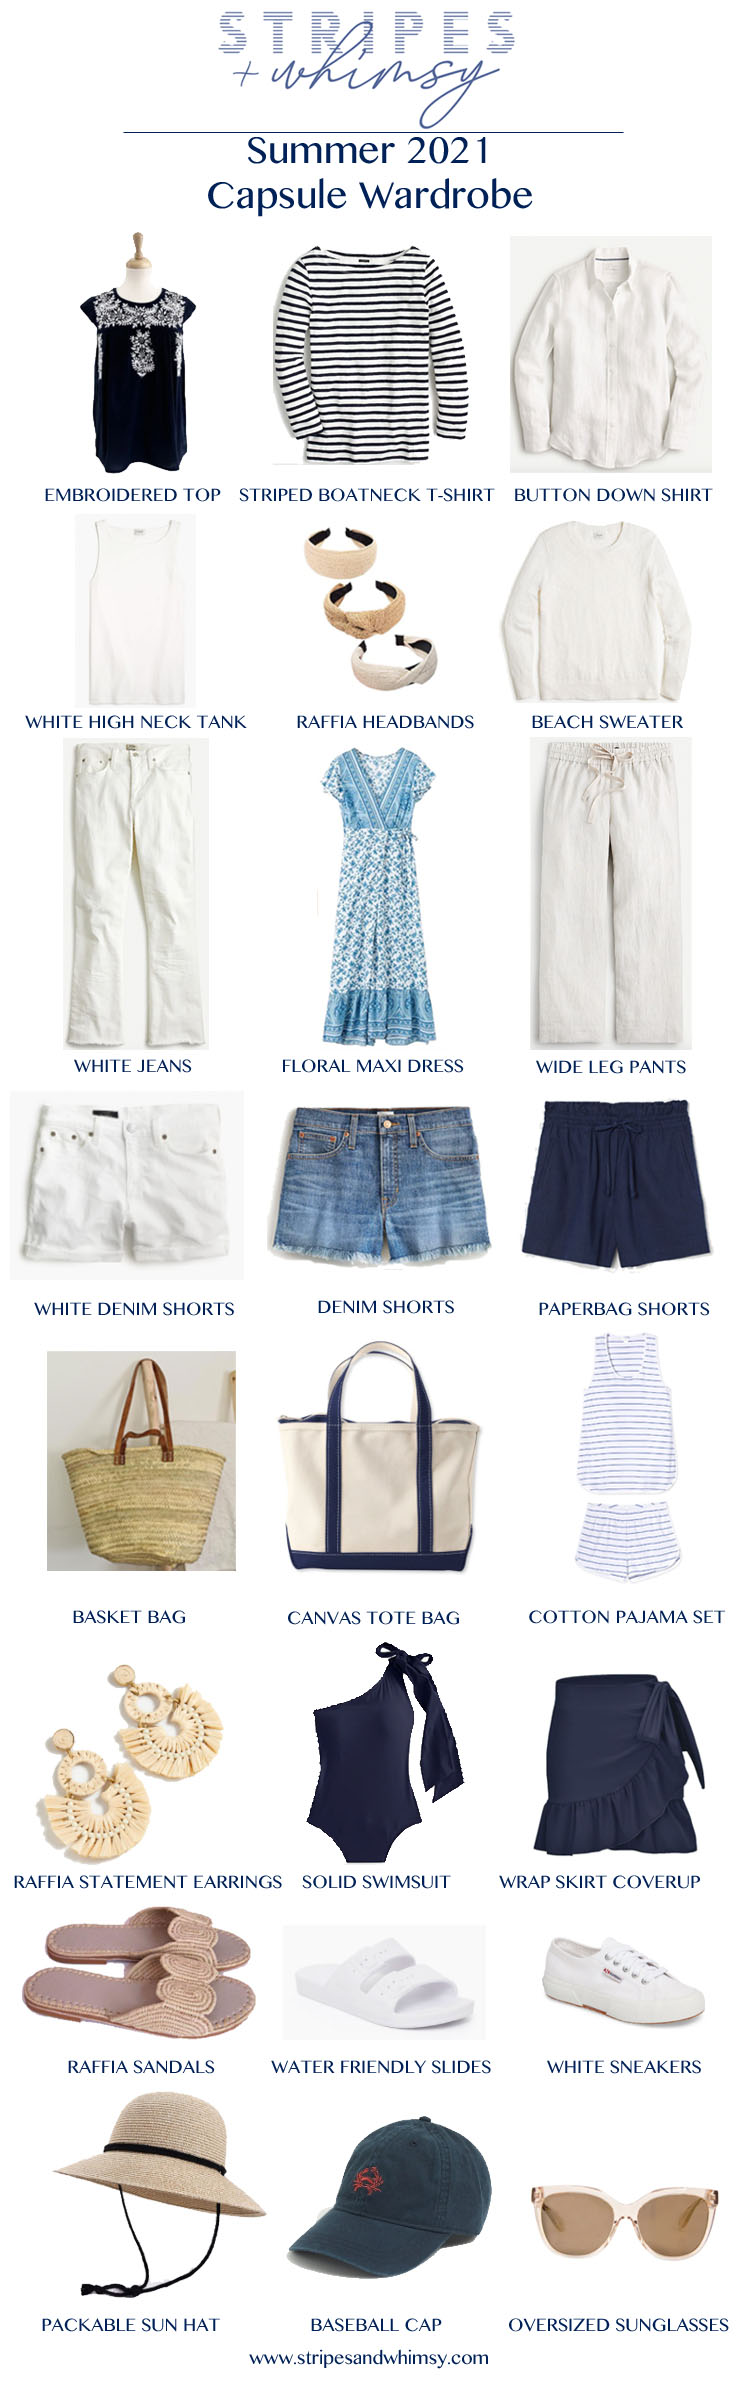 classic style summer capsule wardrobe